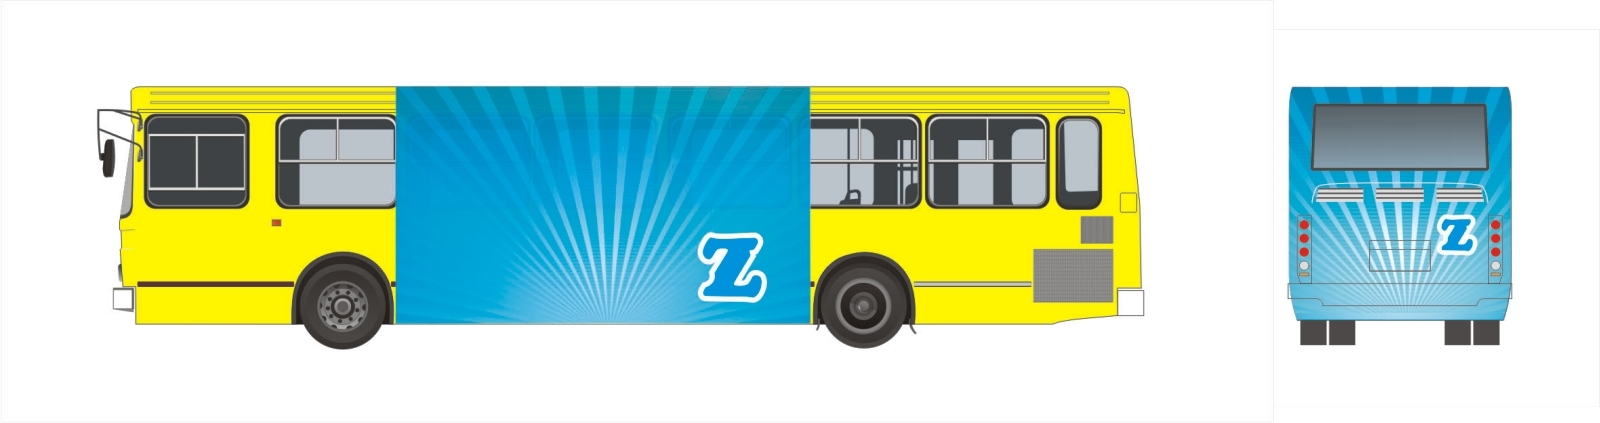 Эффективная реклама на транспорте и на трассах